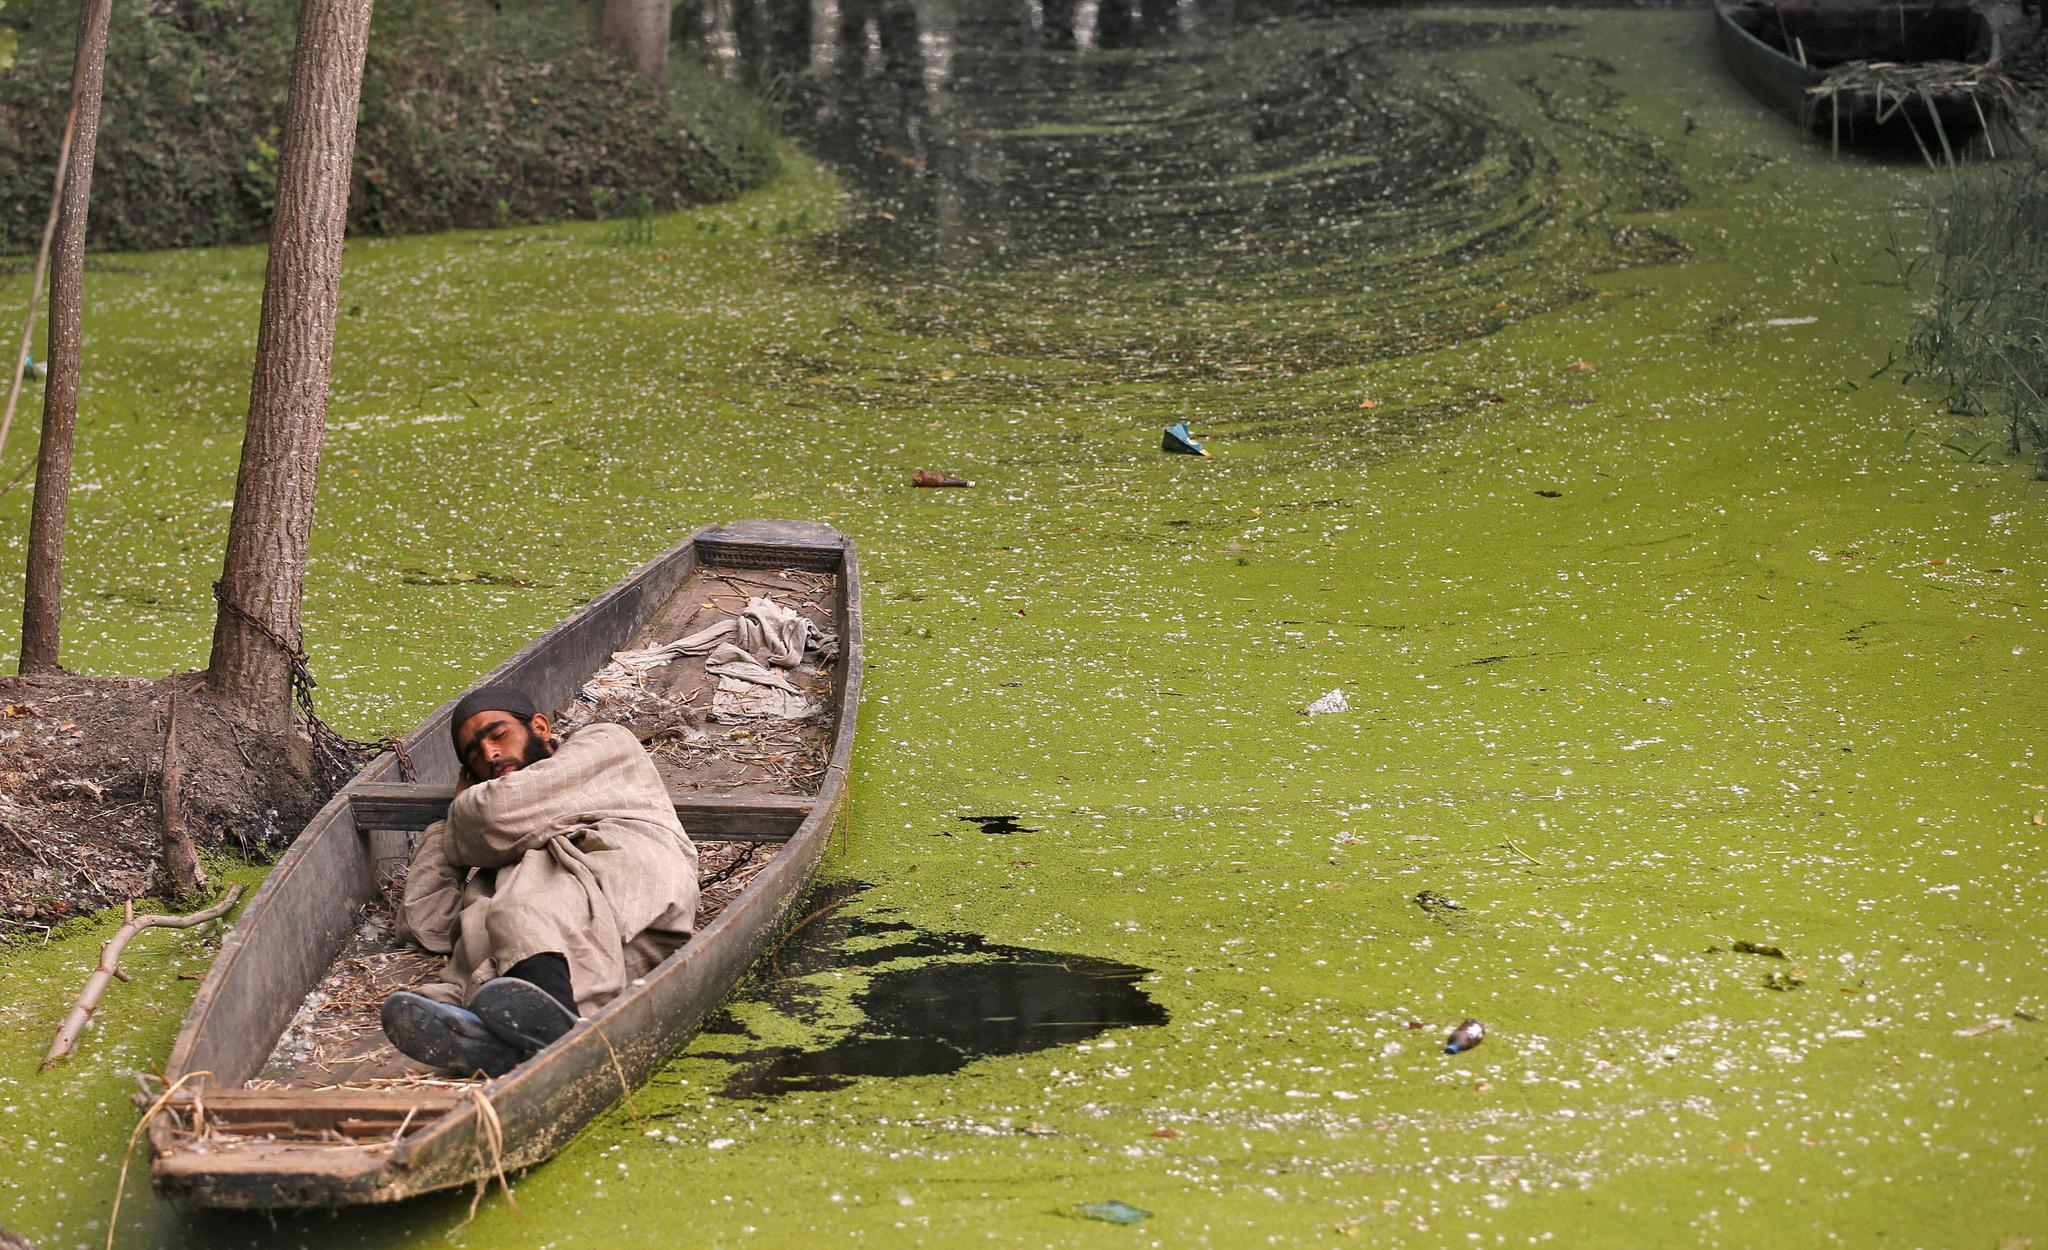 A Kashmiri man sleeps in a boat along the algae-covered Anchar Lake in Srinagar May 12, 2016